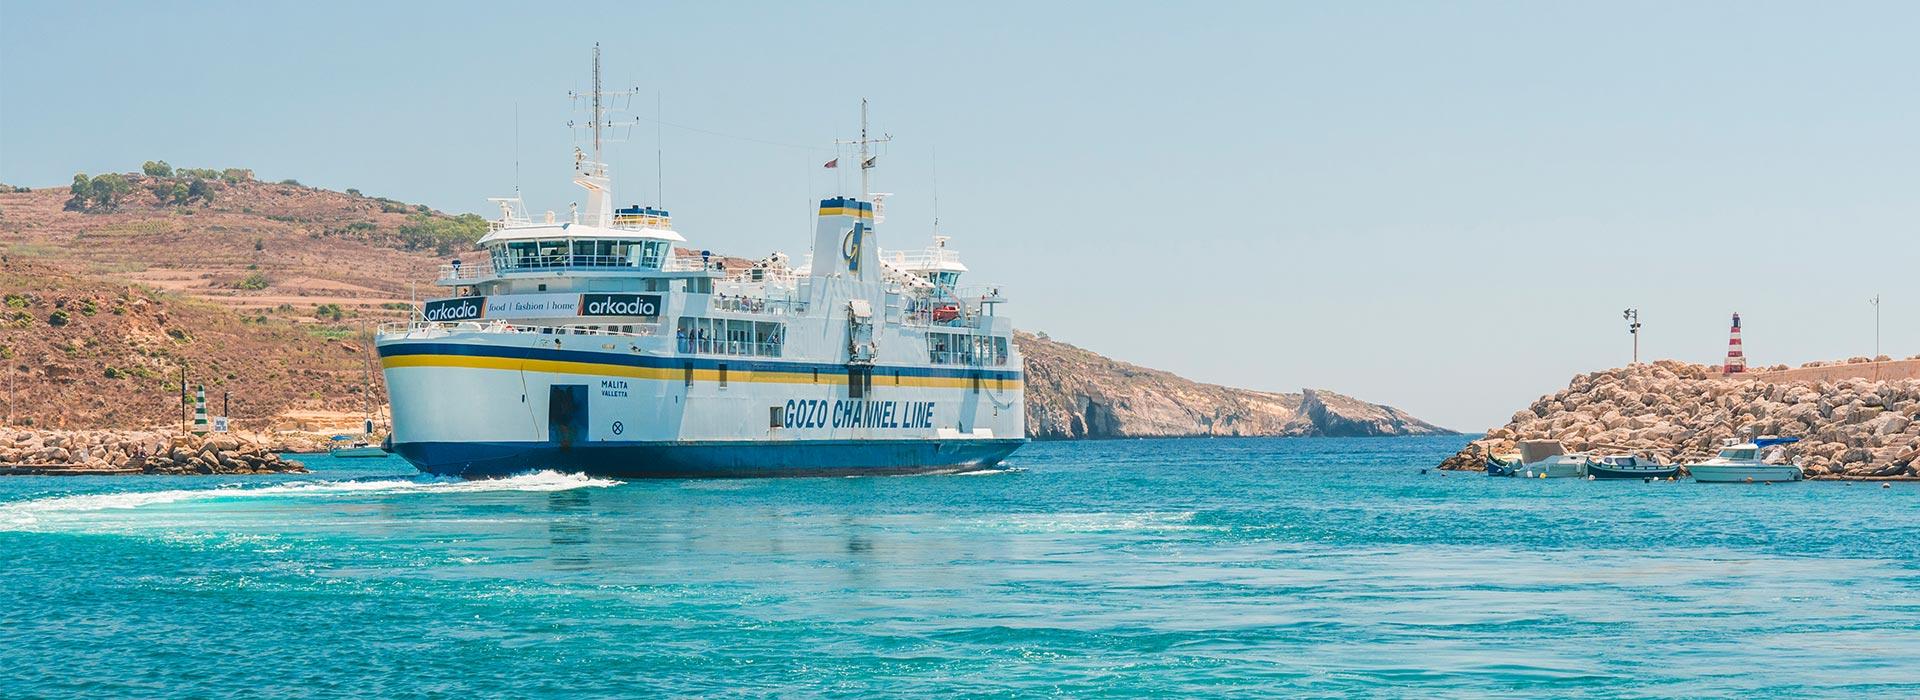 Malta Gozo Tour & Ggantija Temples